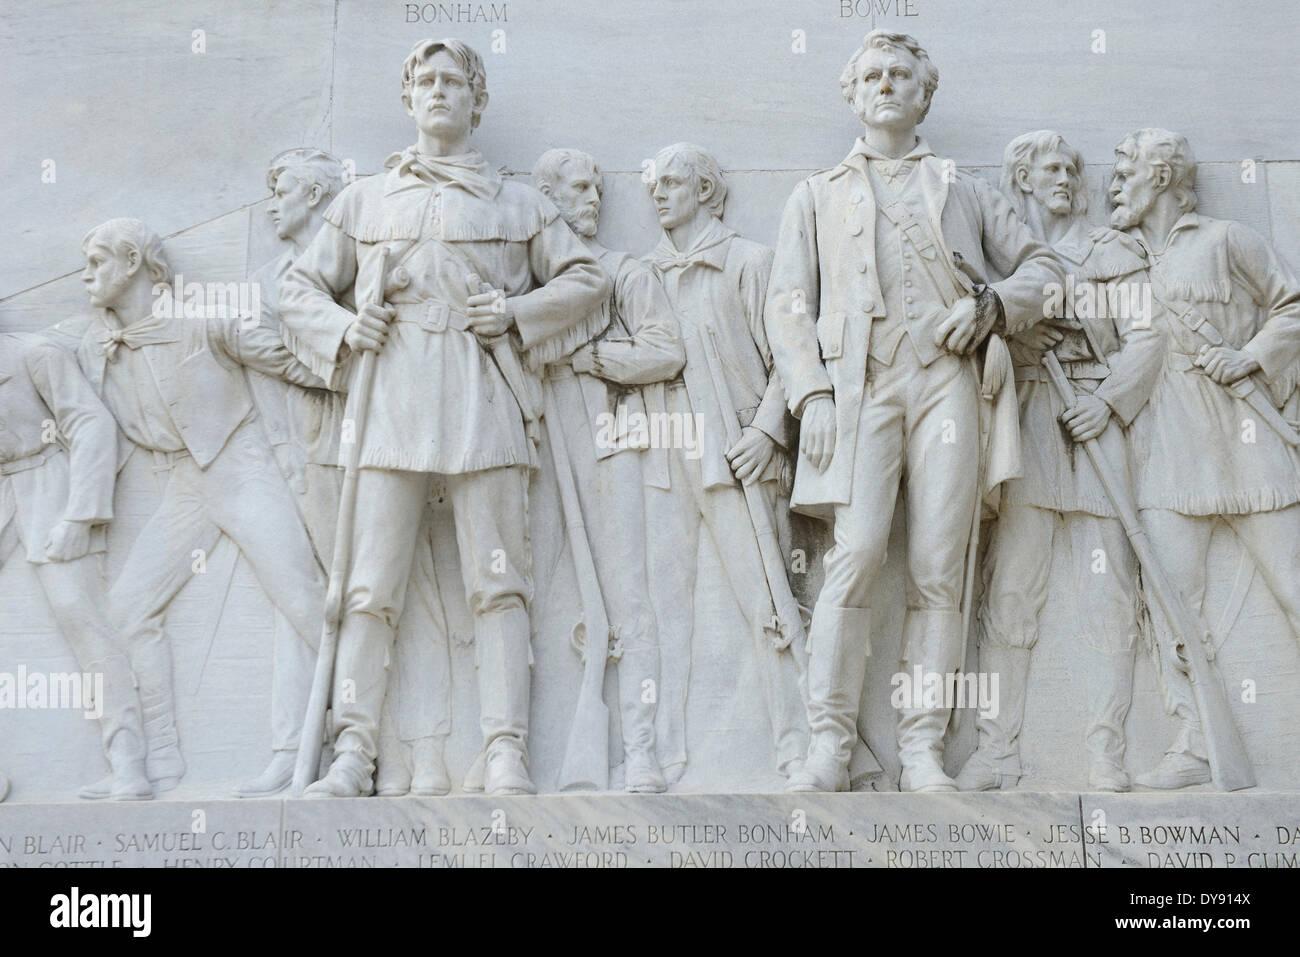 USA, United States, America, Texas, San Antonio, Alamo, monument, memorial, city, battle - Stock Image